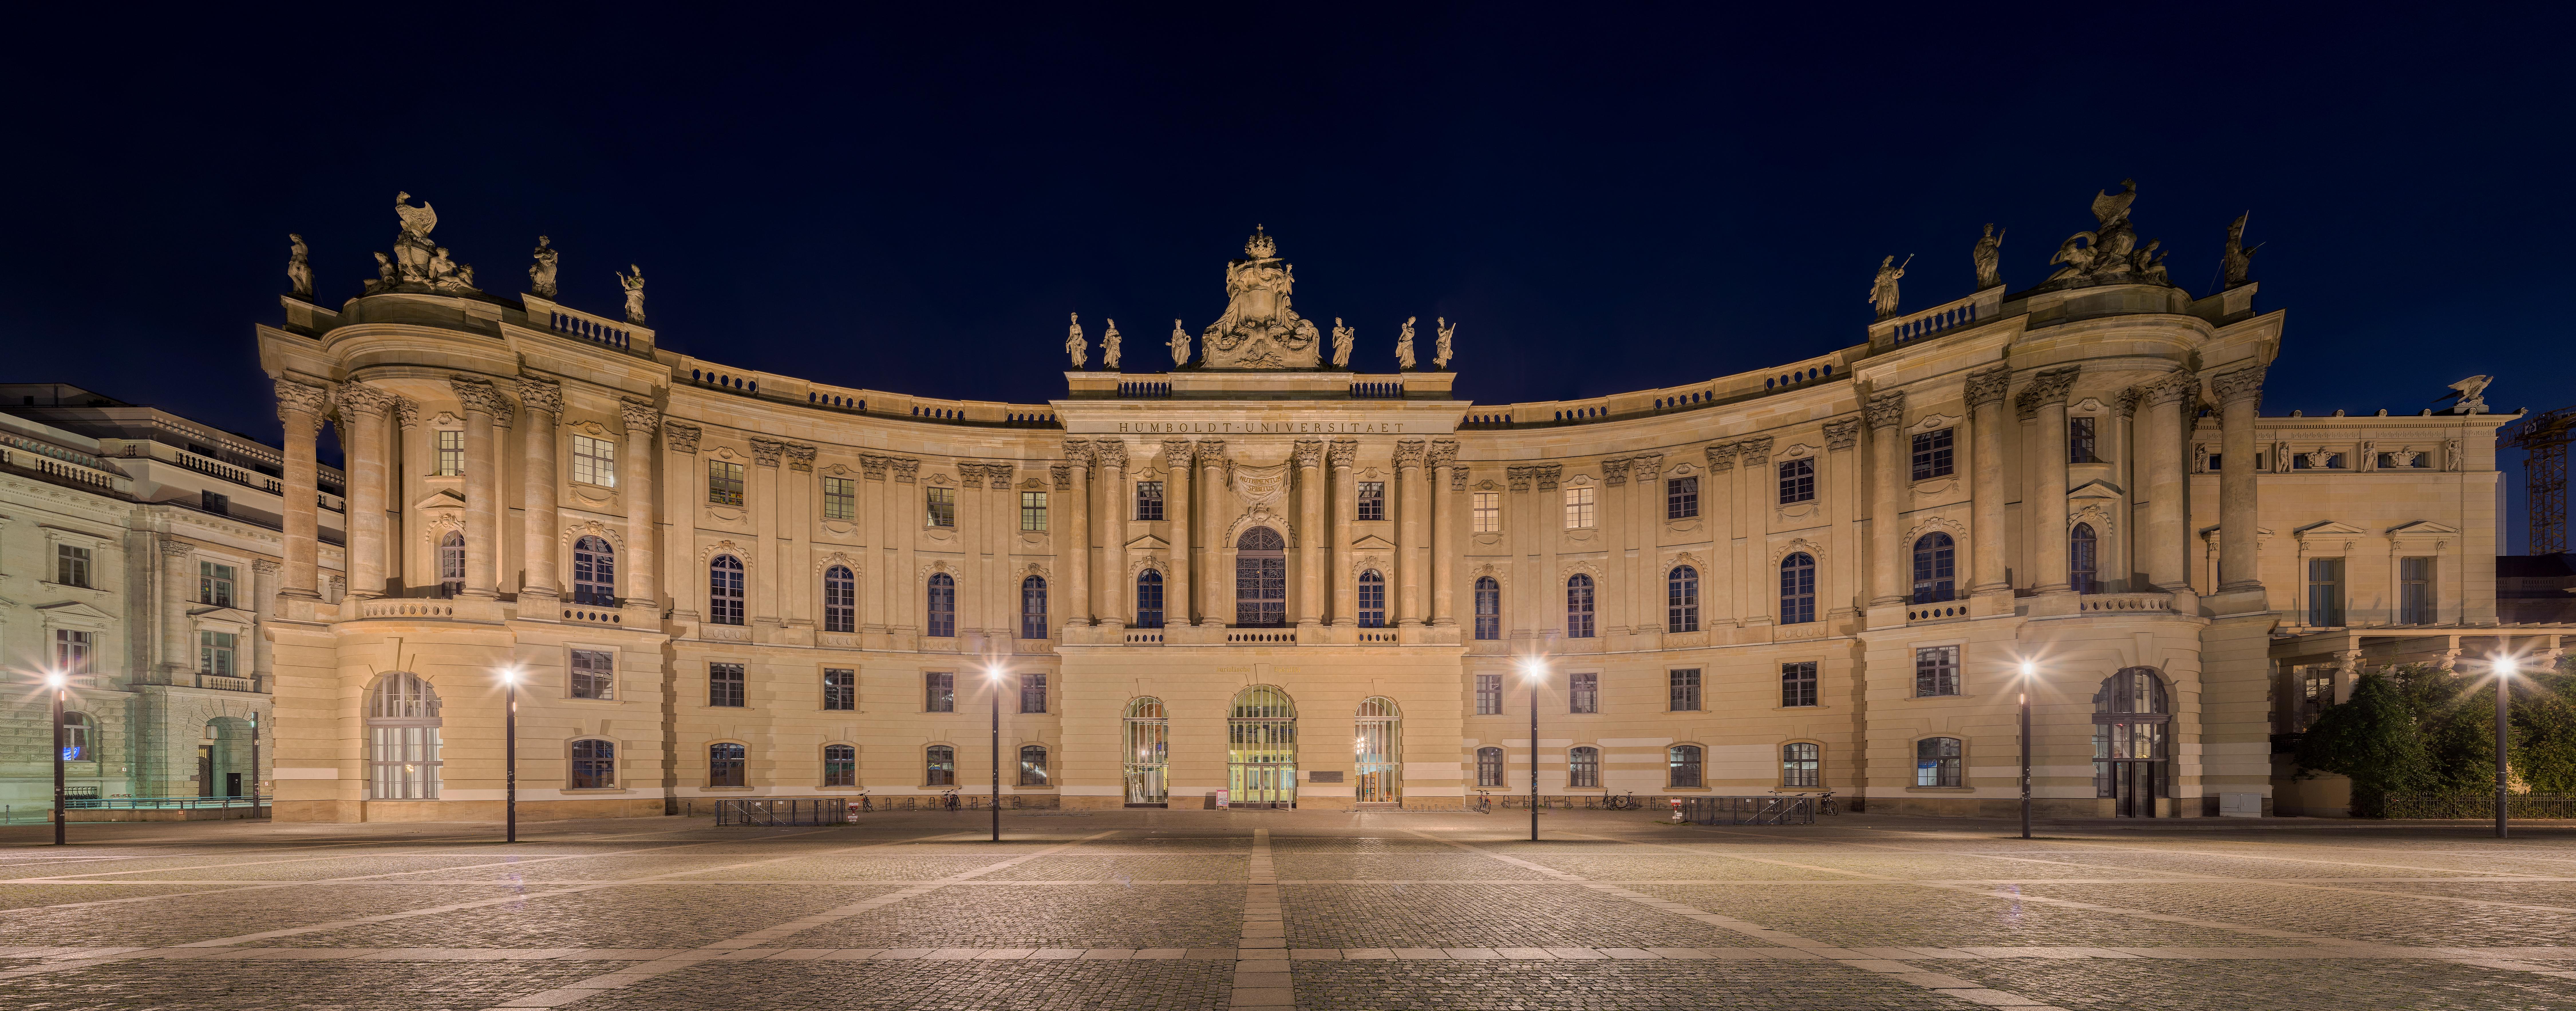 Alte Bibliothek Berlin Wikipedia